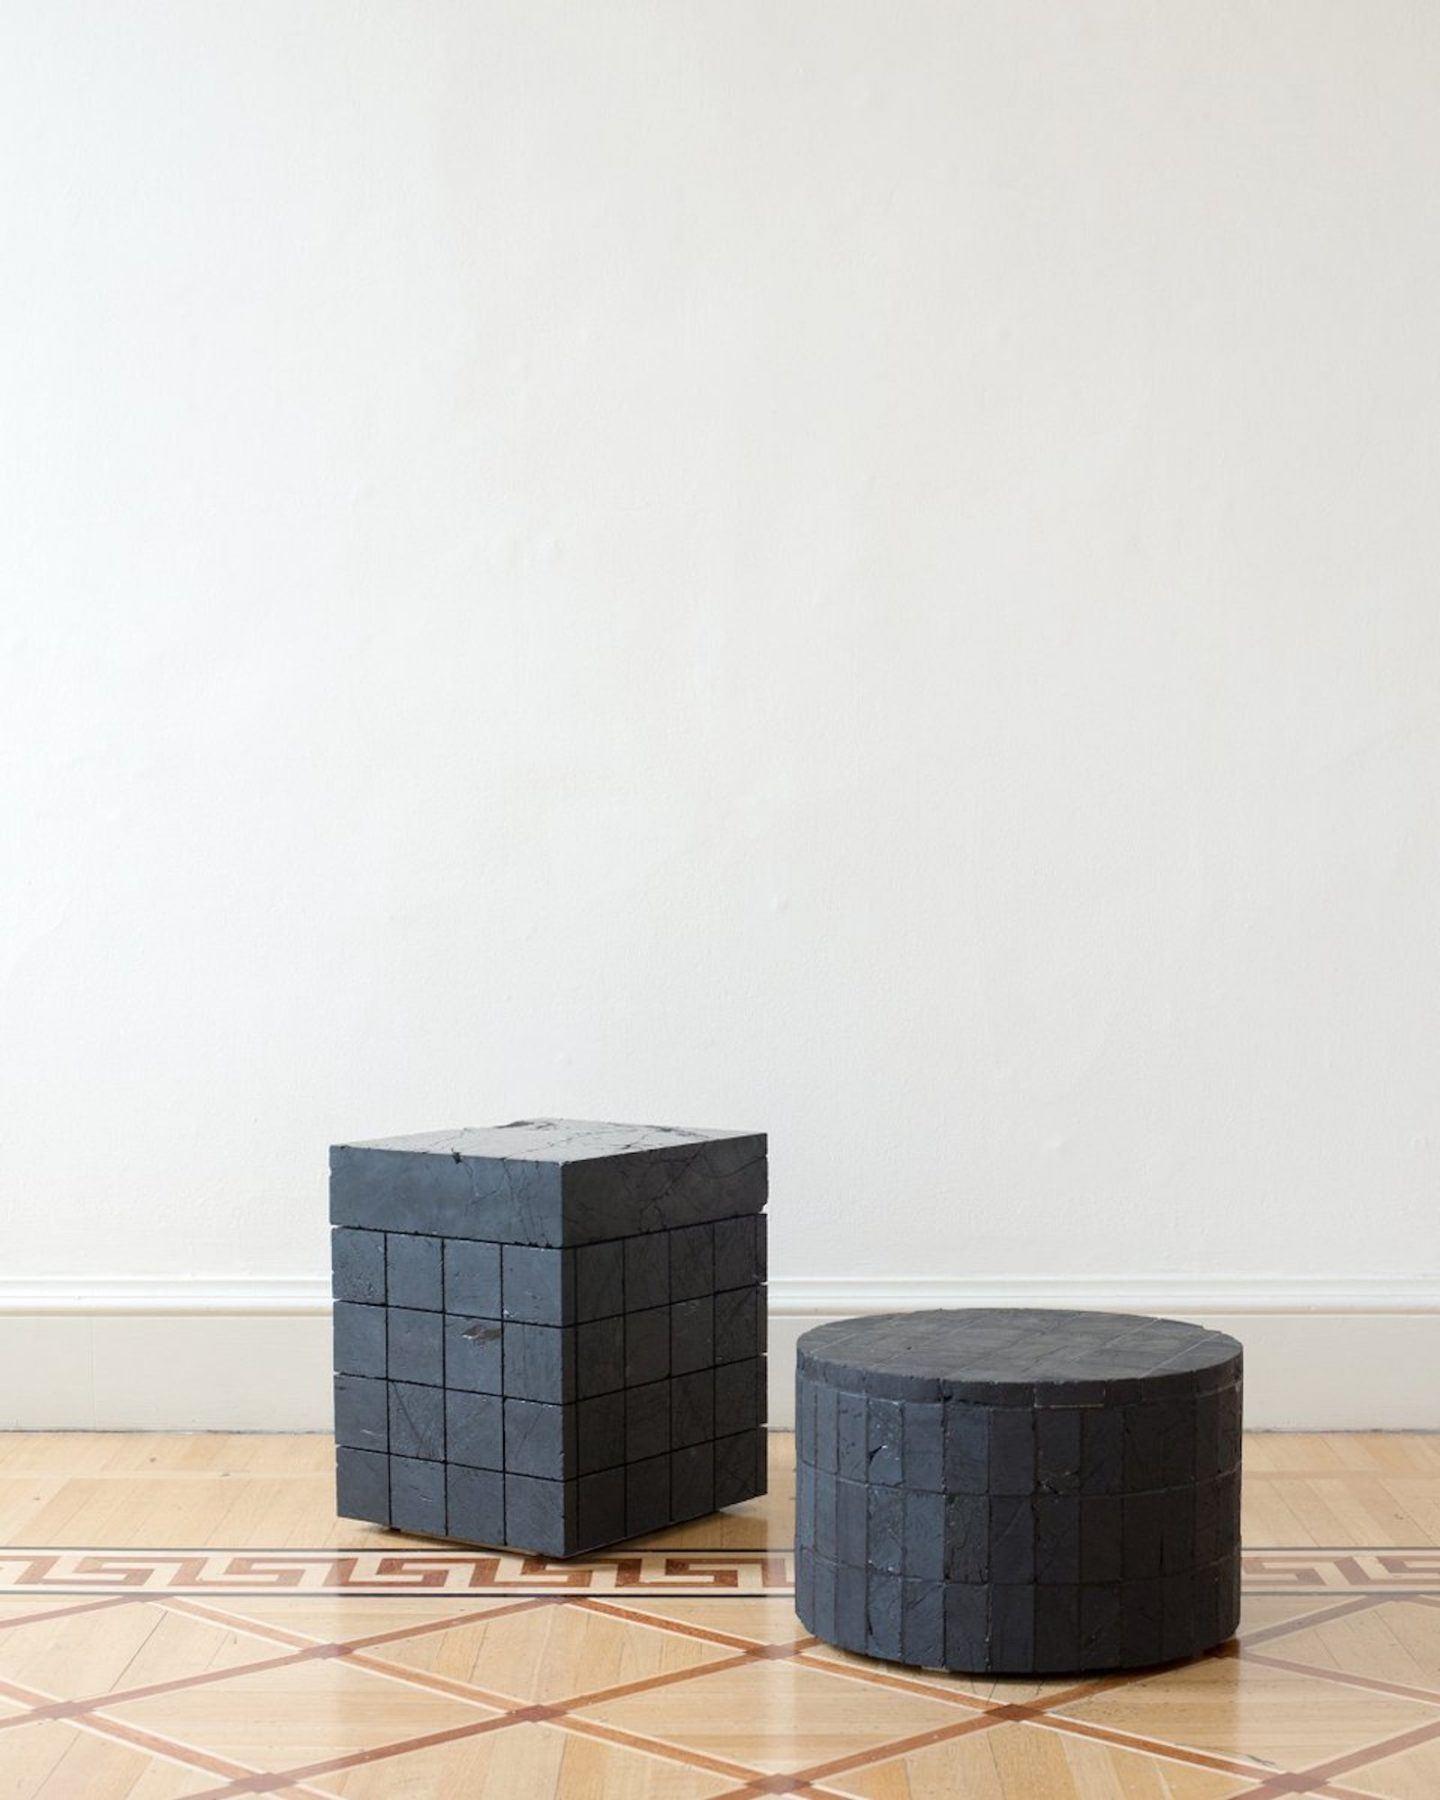 IGNANT-Design-Jesper-Eriksson-Coal-Post-Fuel-005